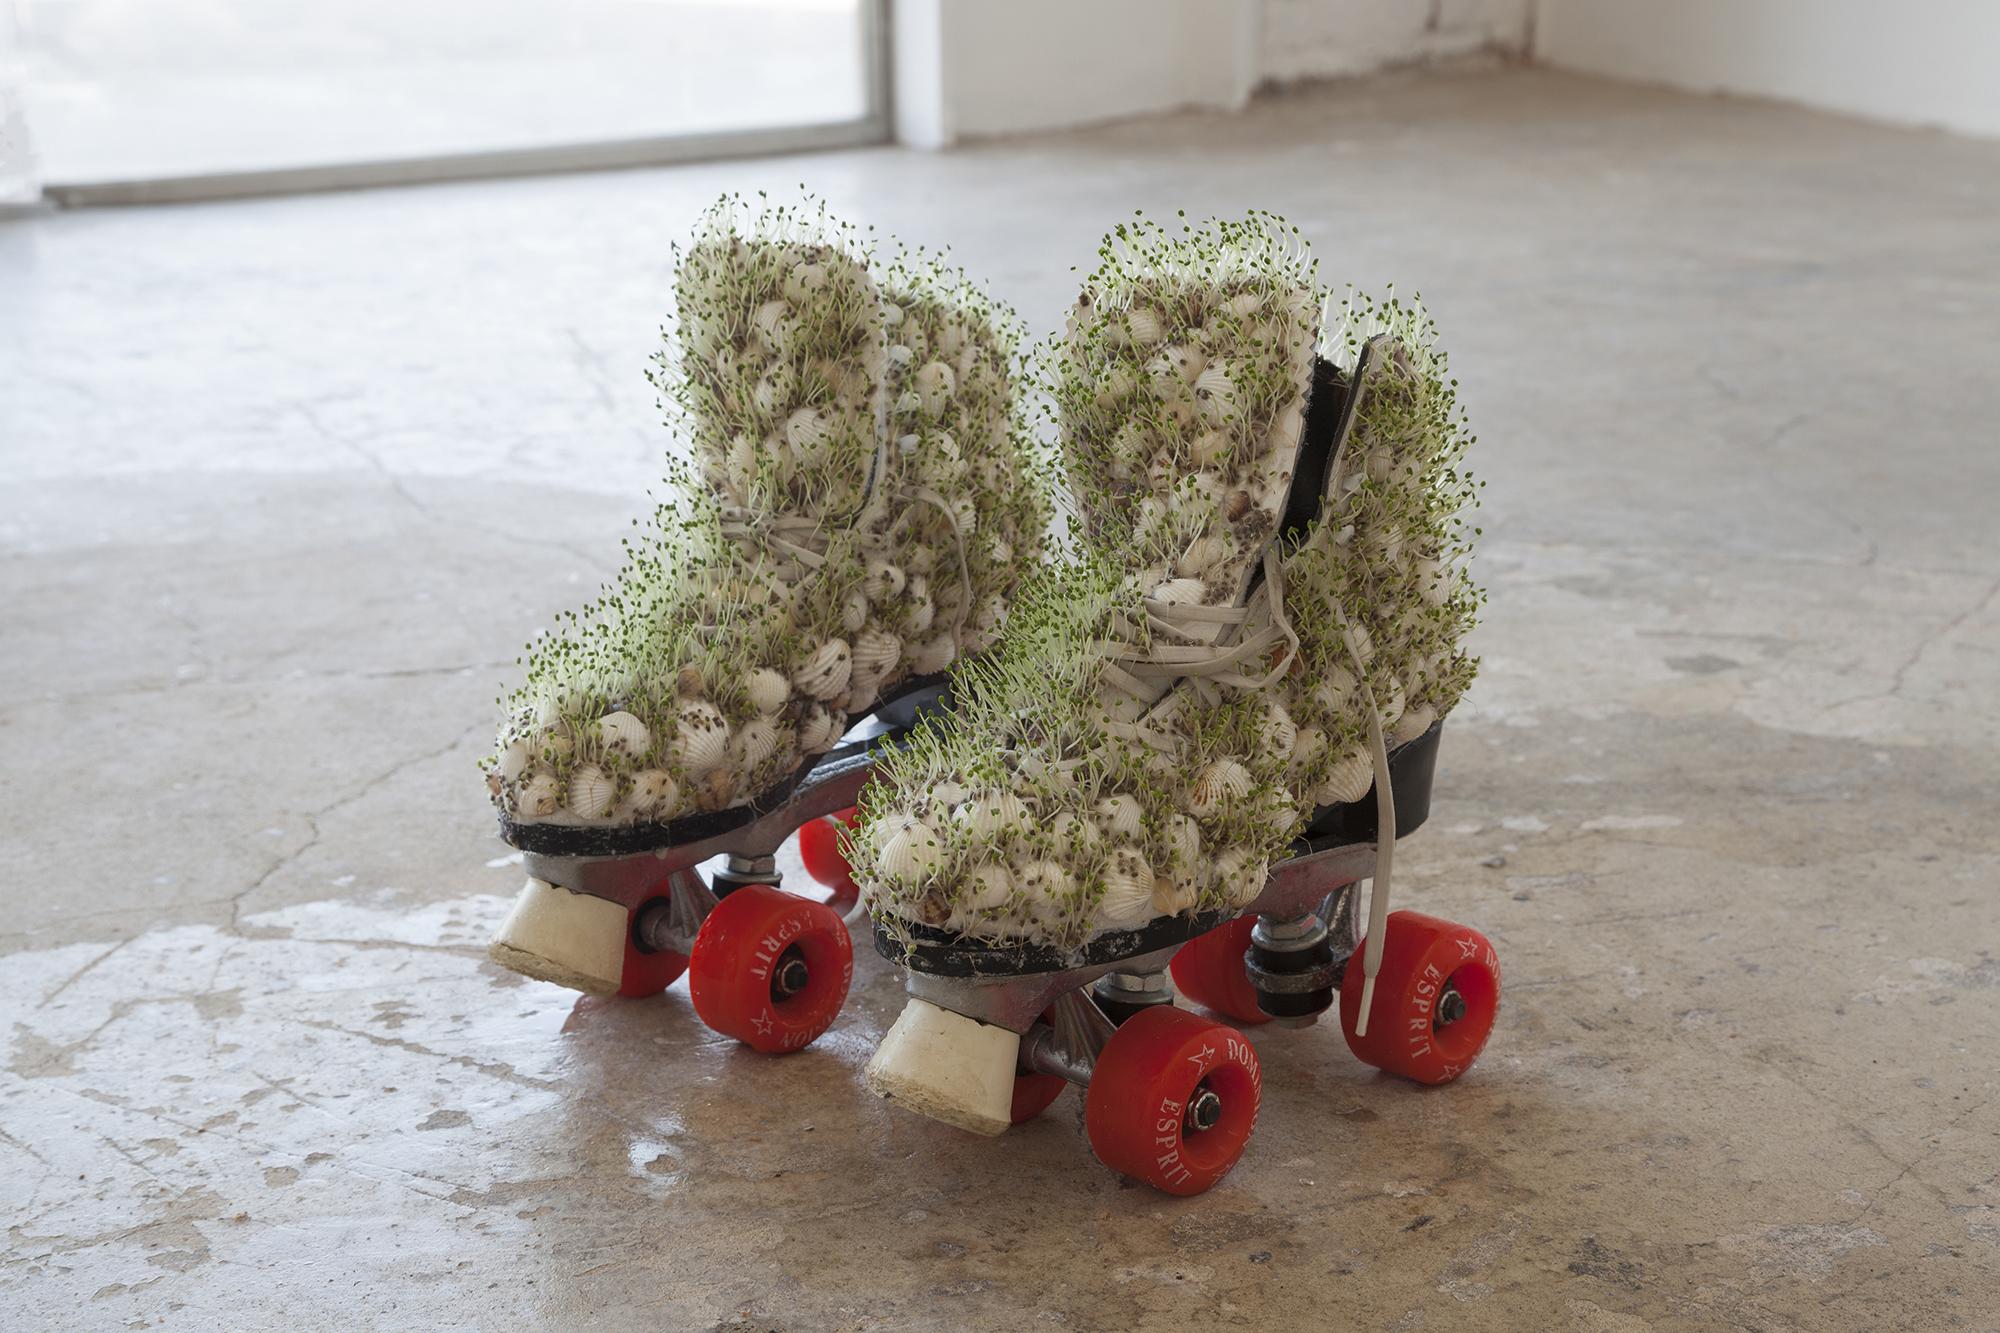 Catalina Ouyang, chia skates, 2018, roller skates, chia plants, image courtesy of Make Room LA